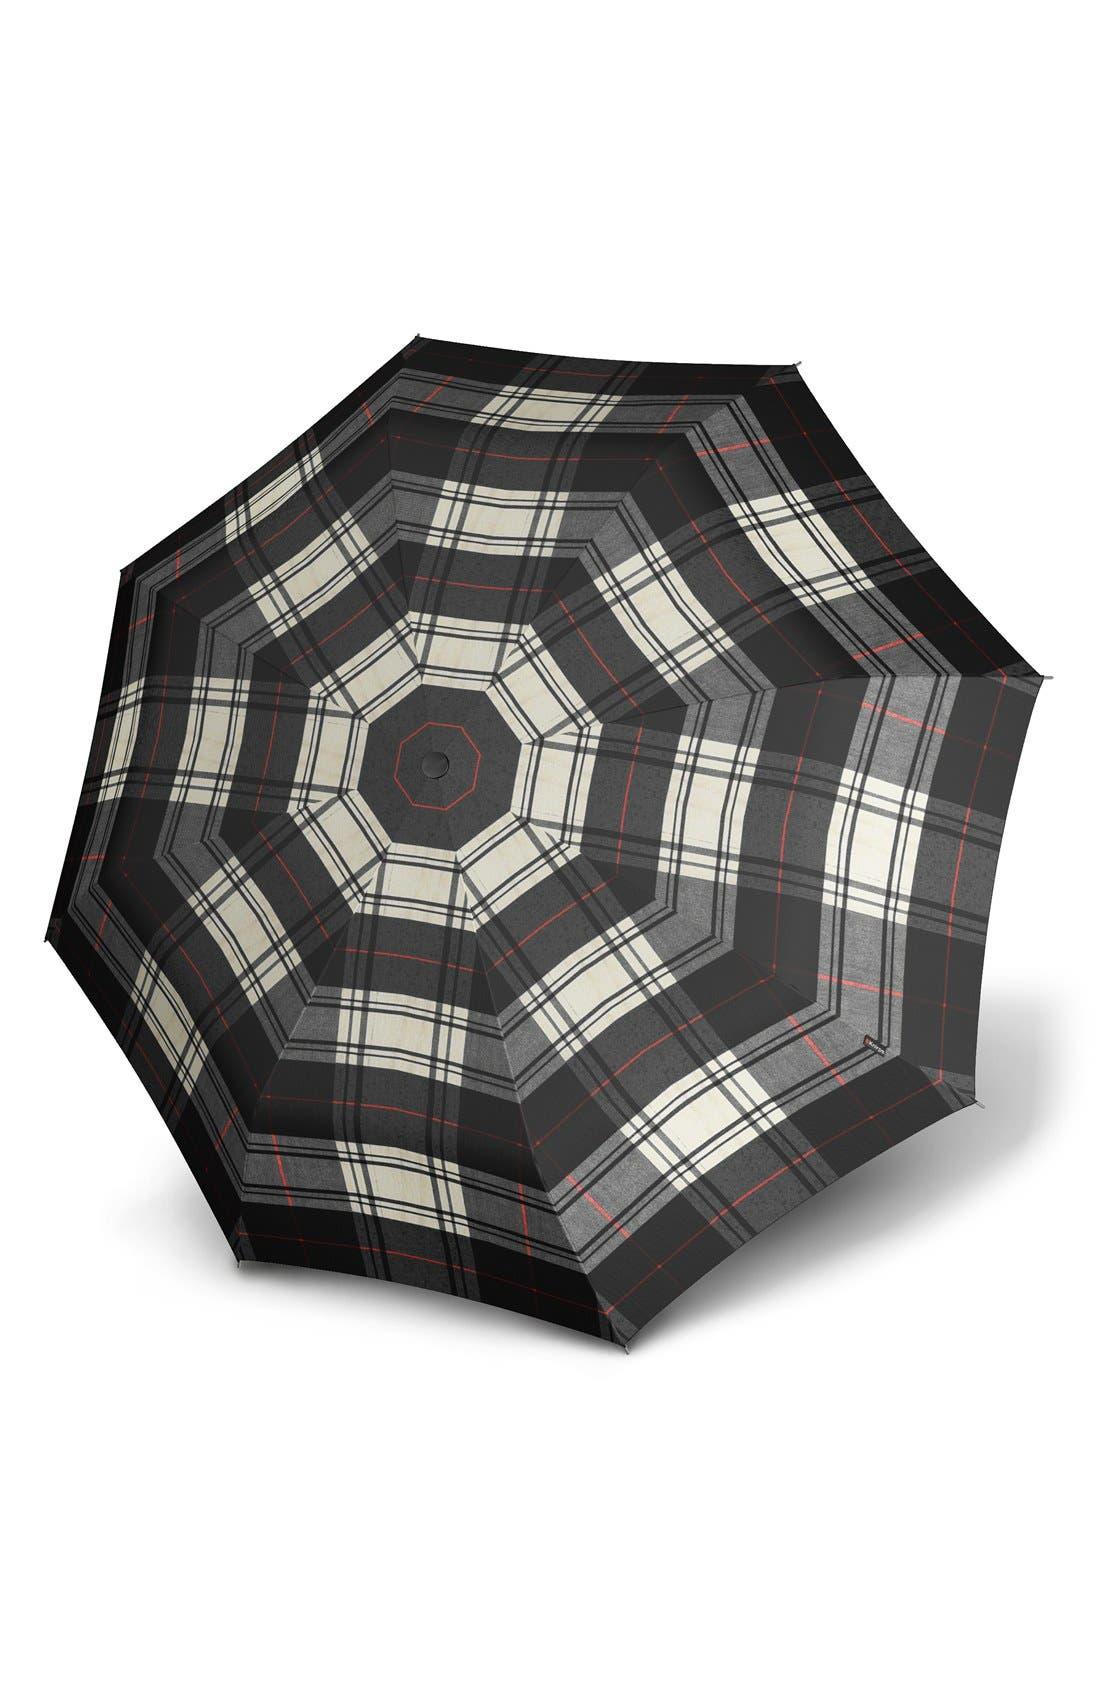 Alternate Image 1 Selected - Knirps 'Duomatic' Umbrella